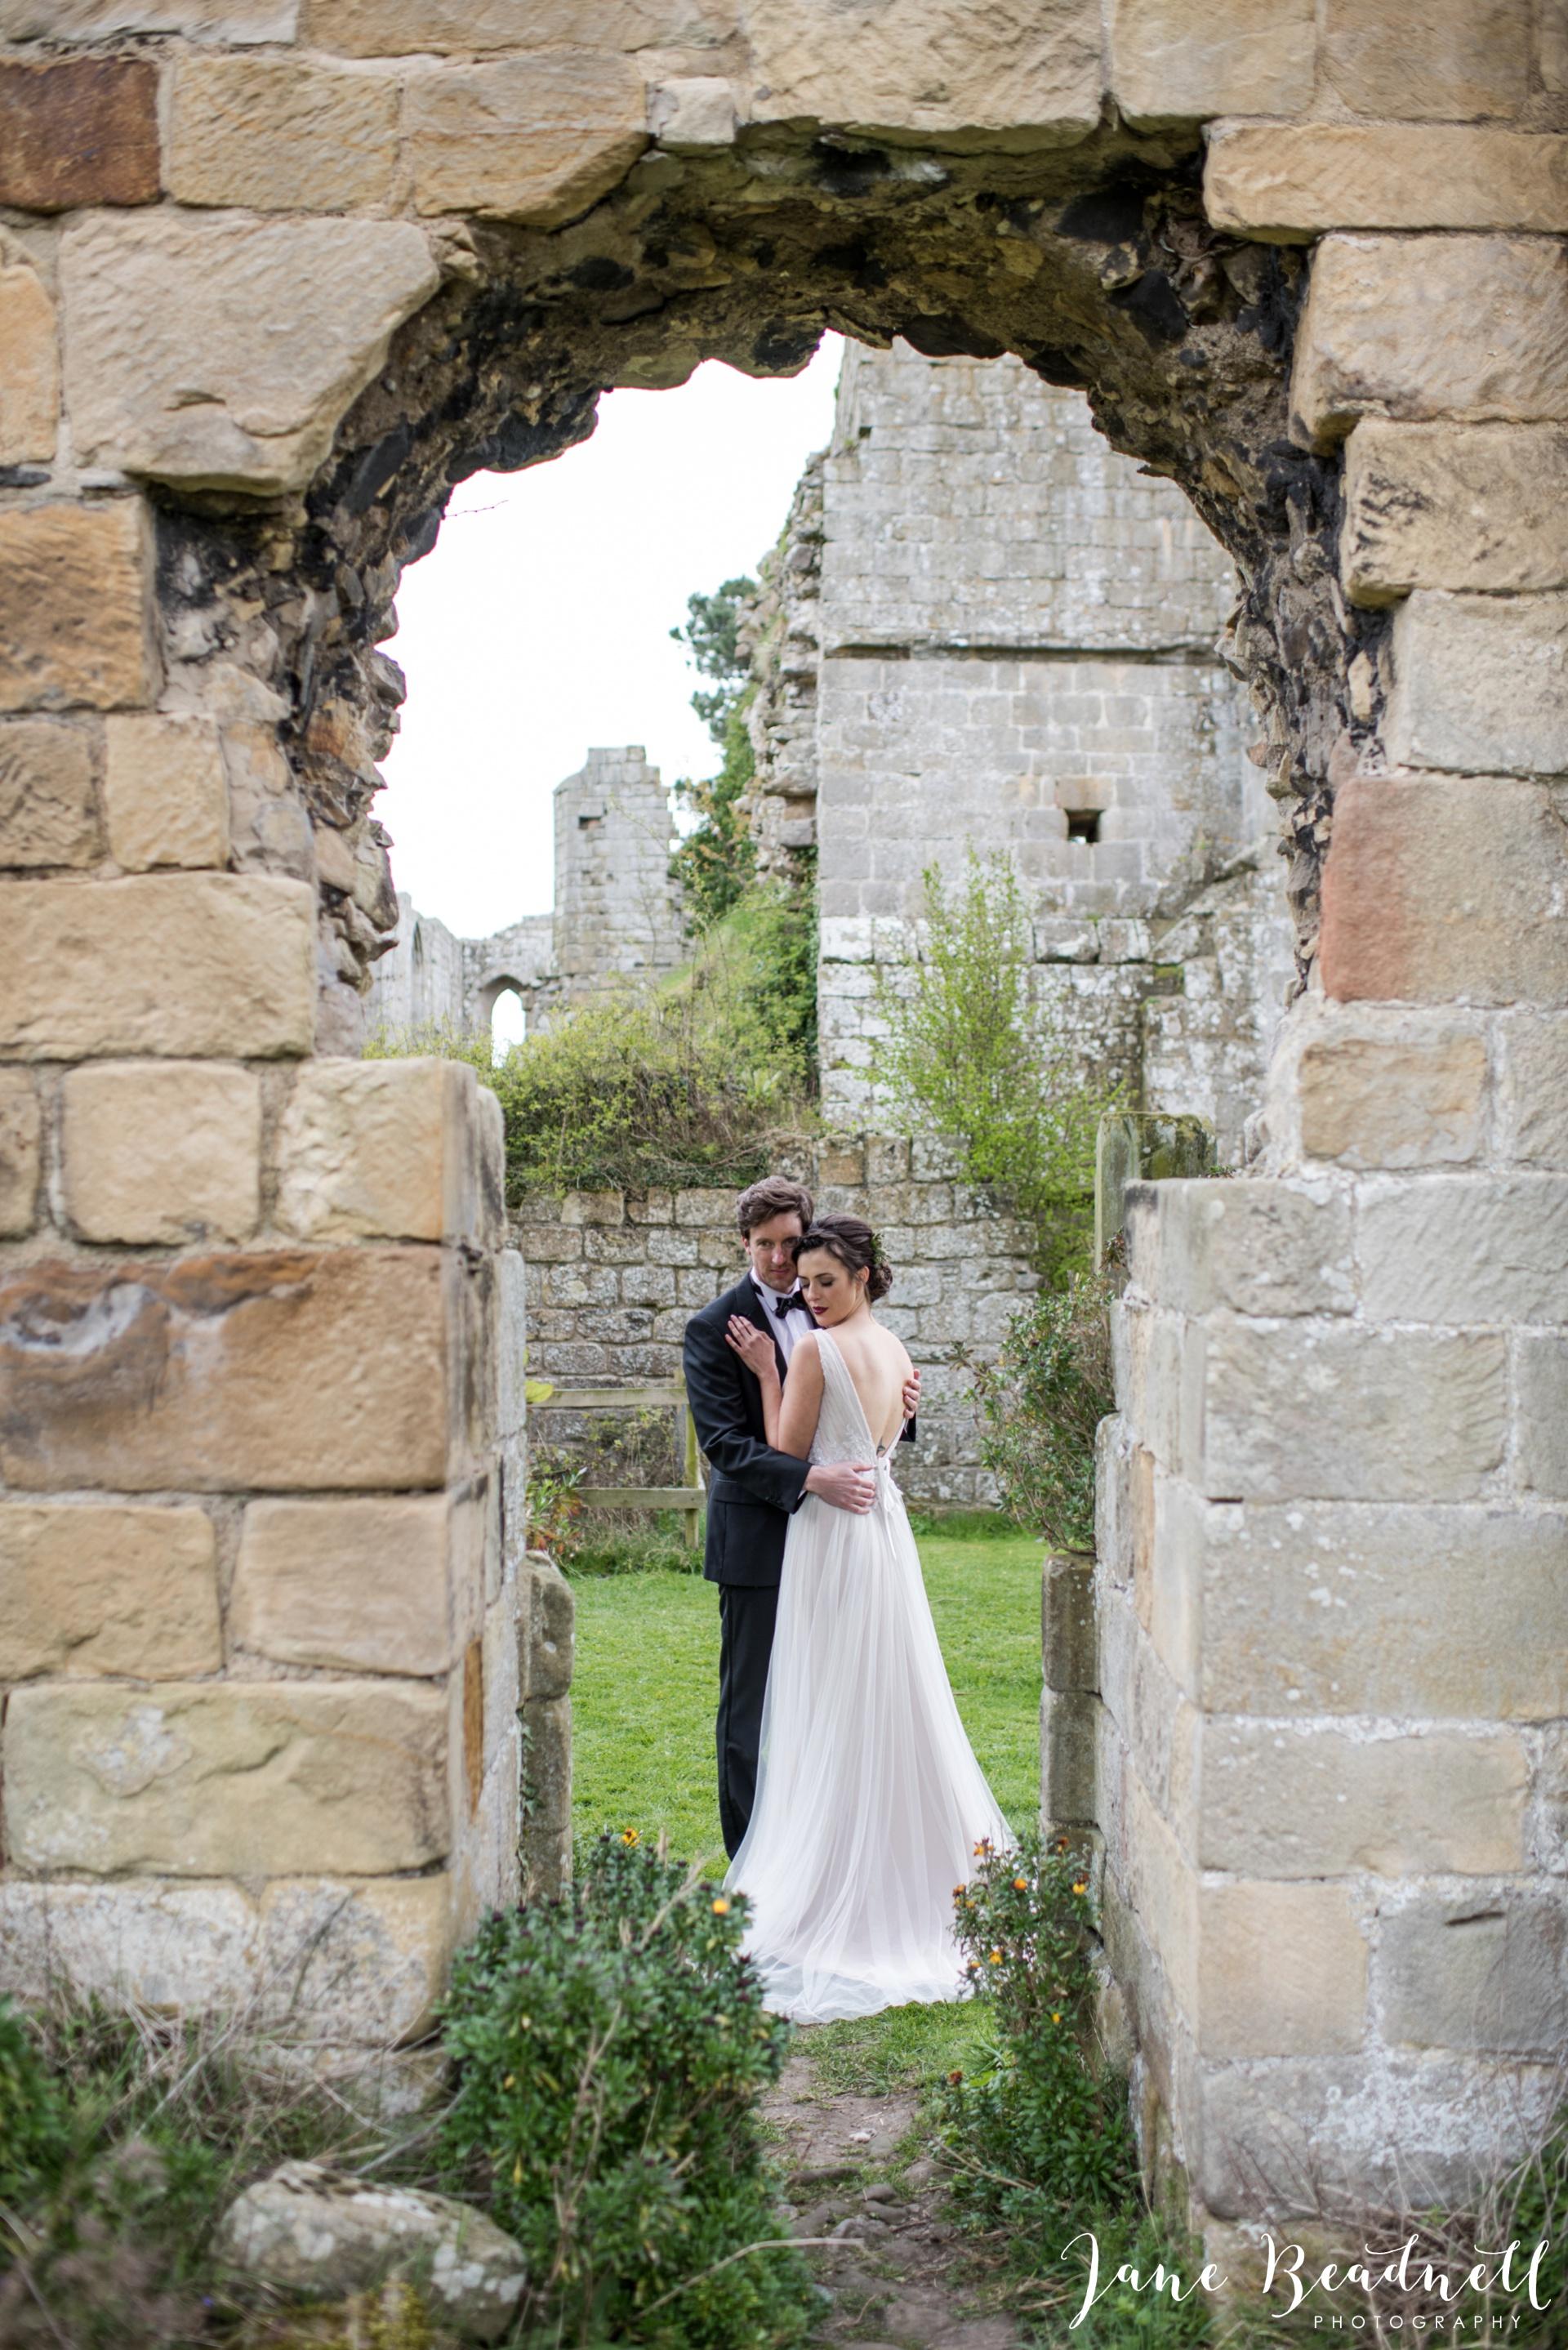 Jervaulx Abbey wedding photography fine art wedding photographer jane beadnell_0013